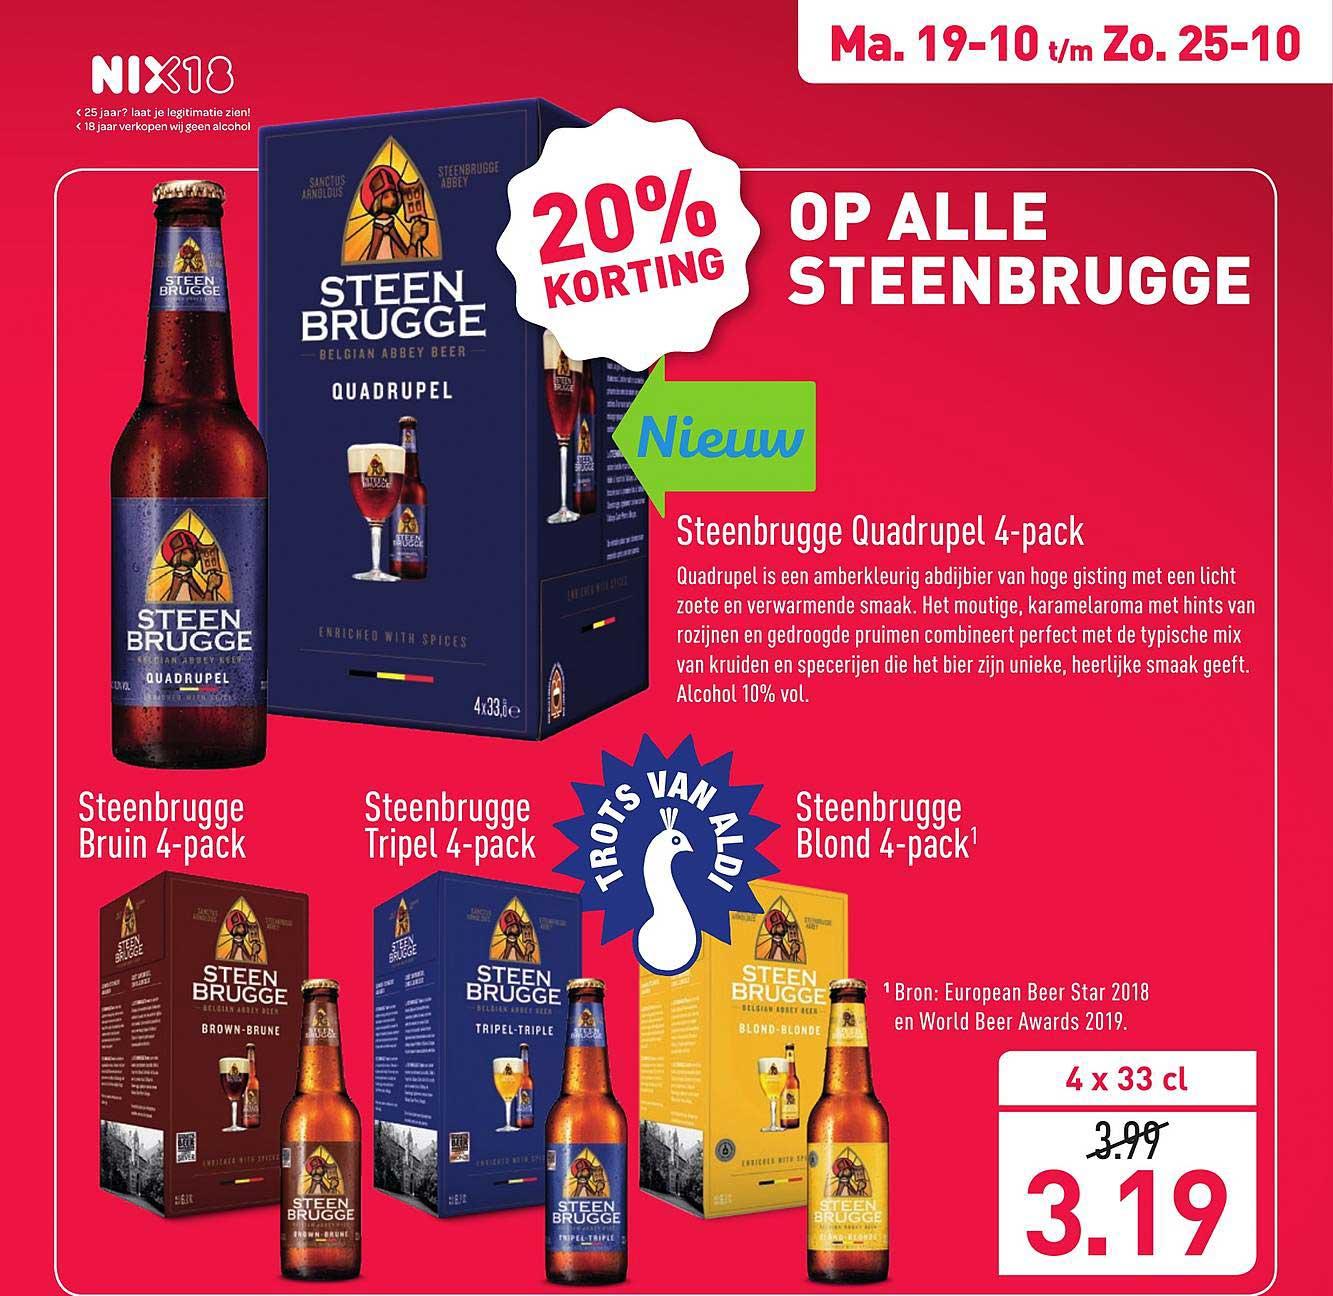 ALDI Steenbrugge Quadrupel 4-Pack 20% Korting